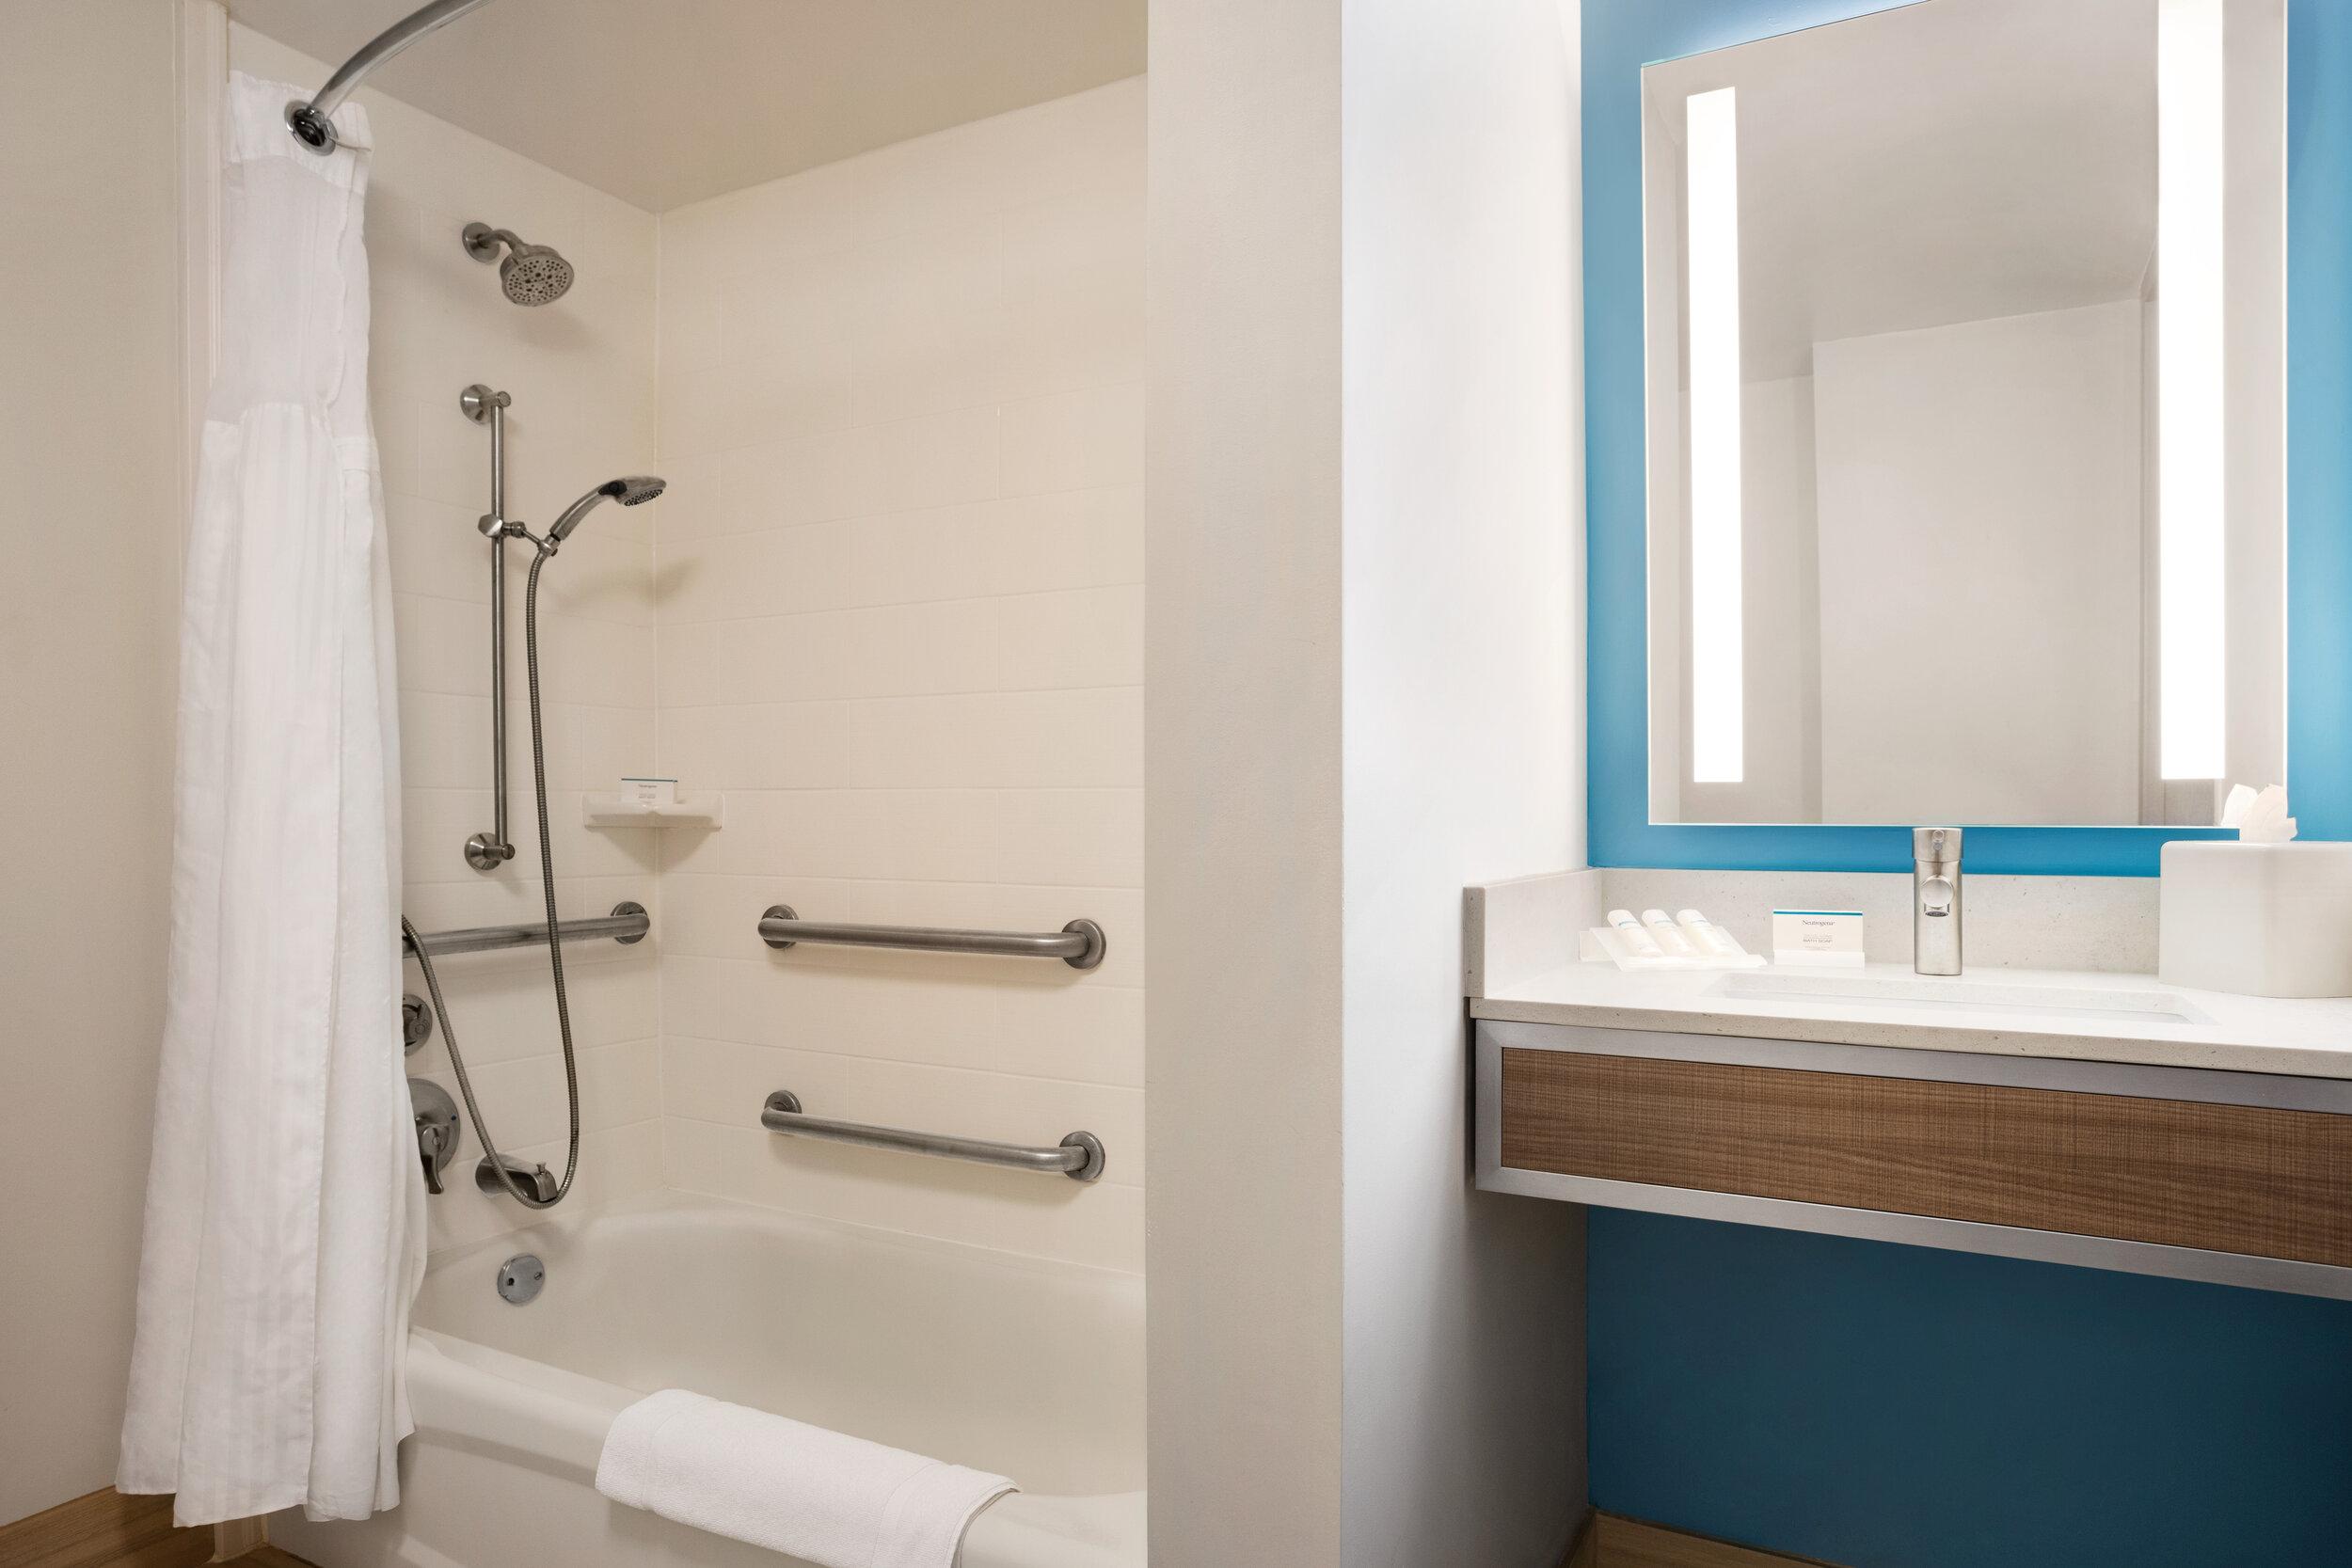 MSYGI_Accessible_Bathroom_01.jpg